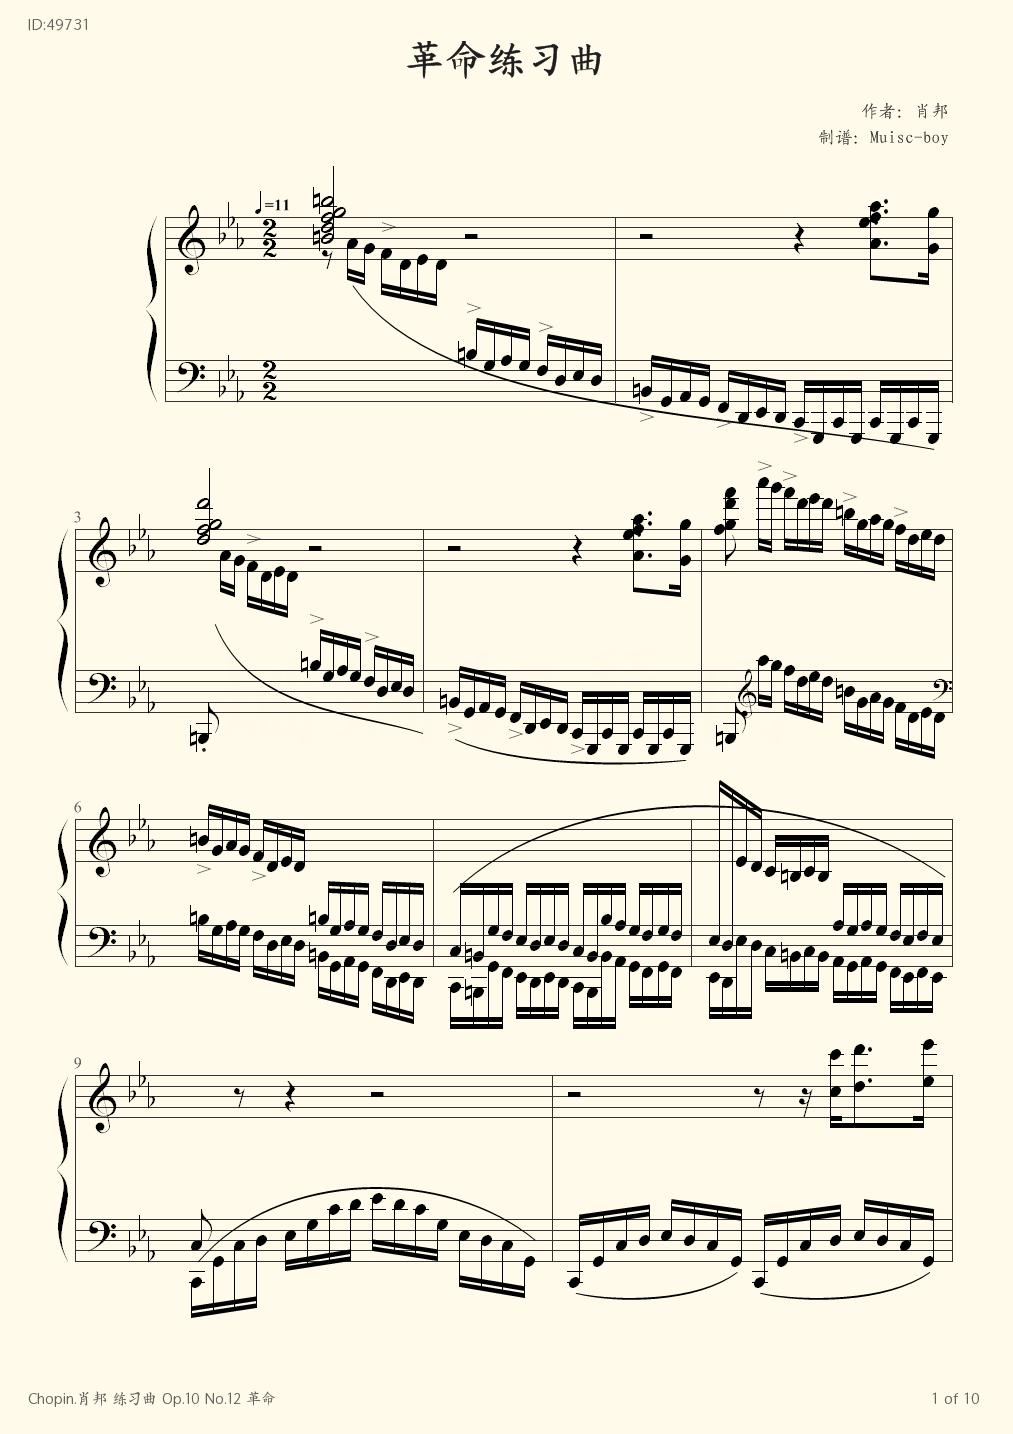 Chopin Op 10 No 12  - Chopin  - first page